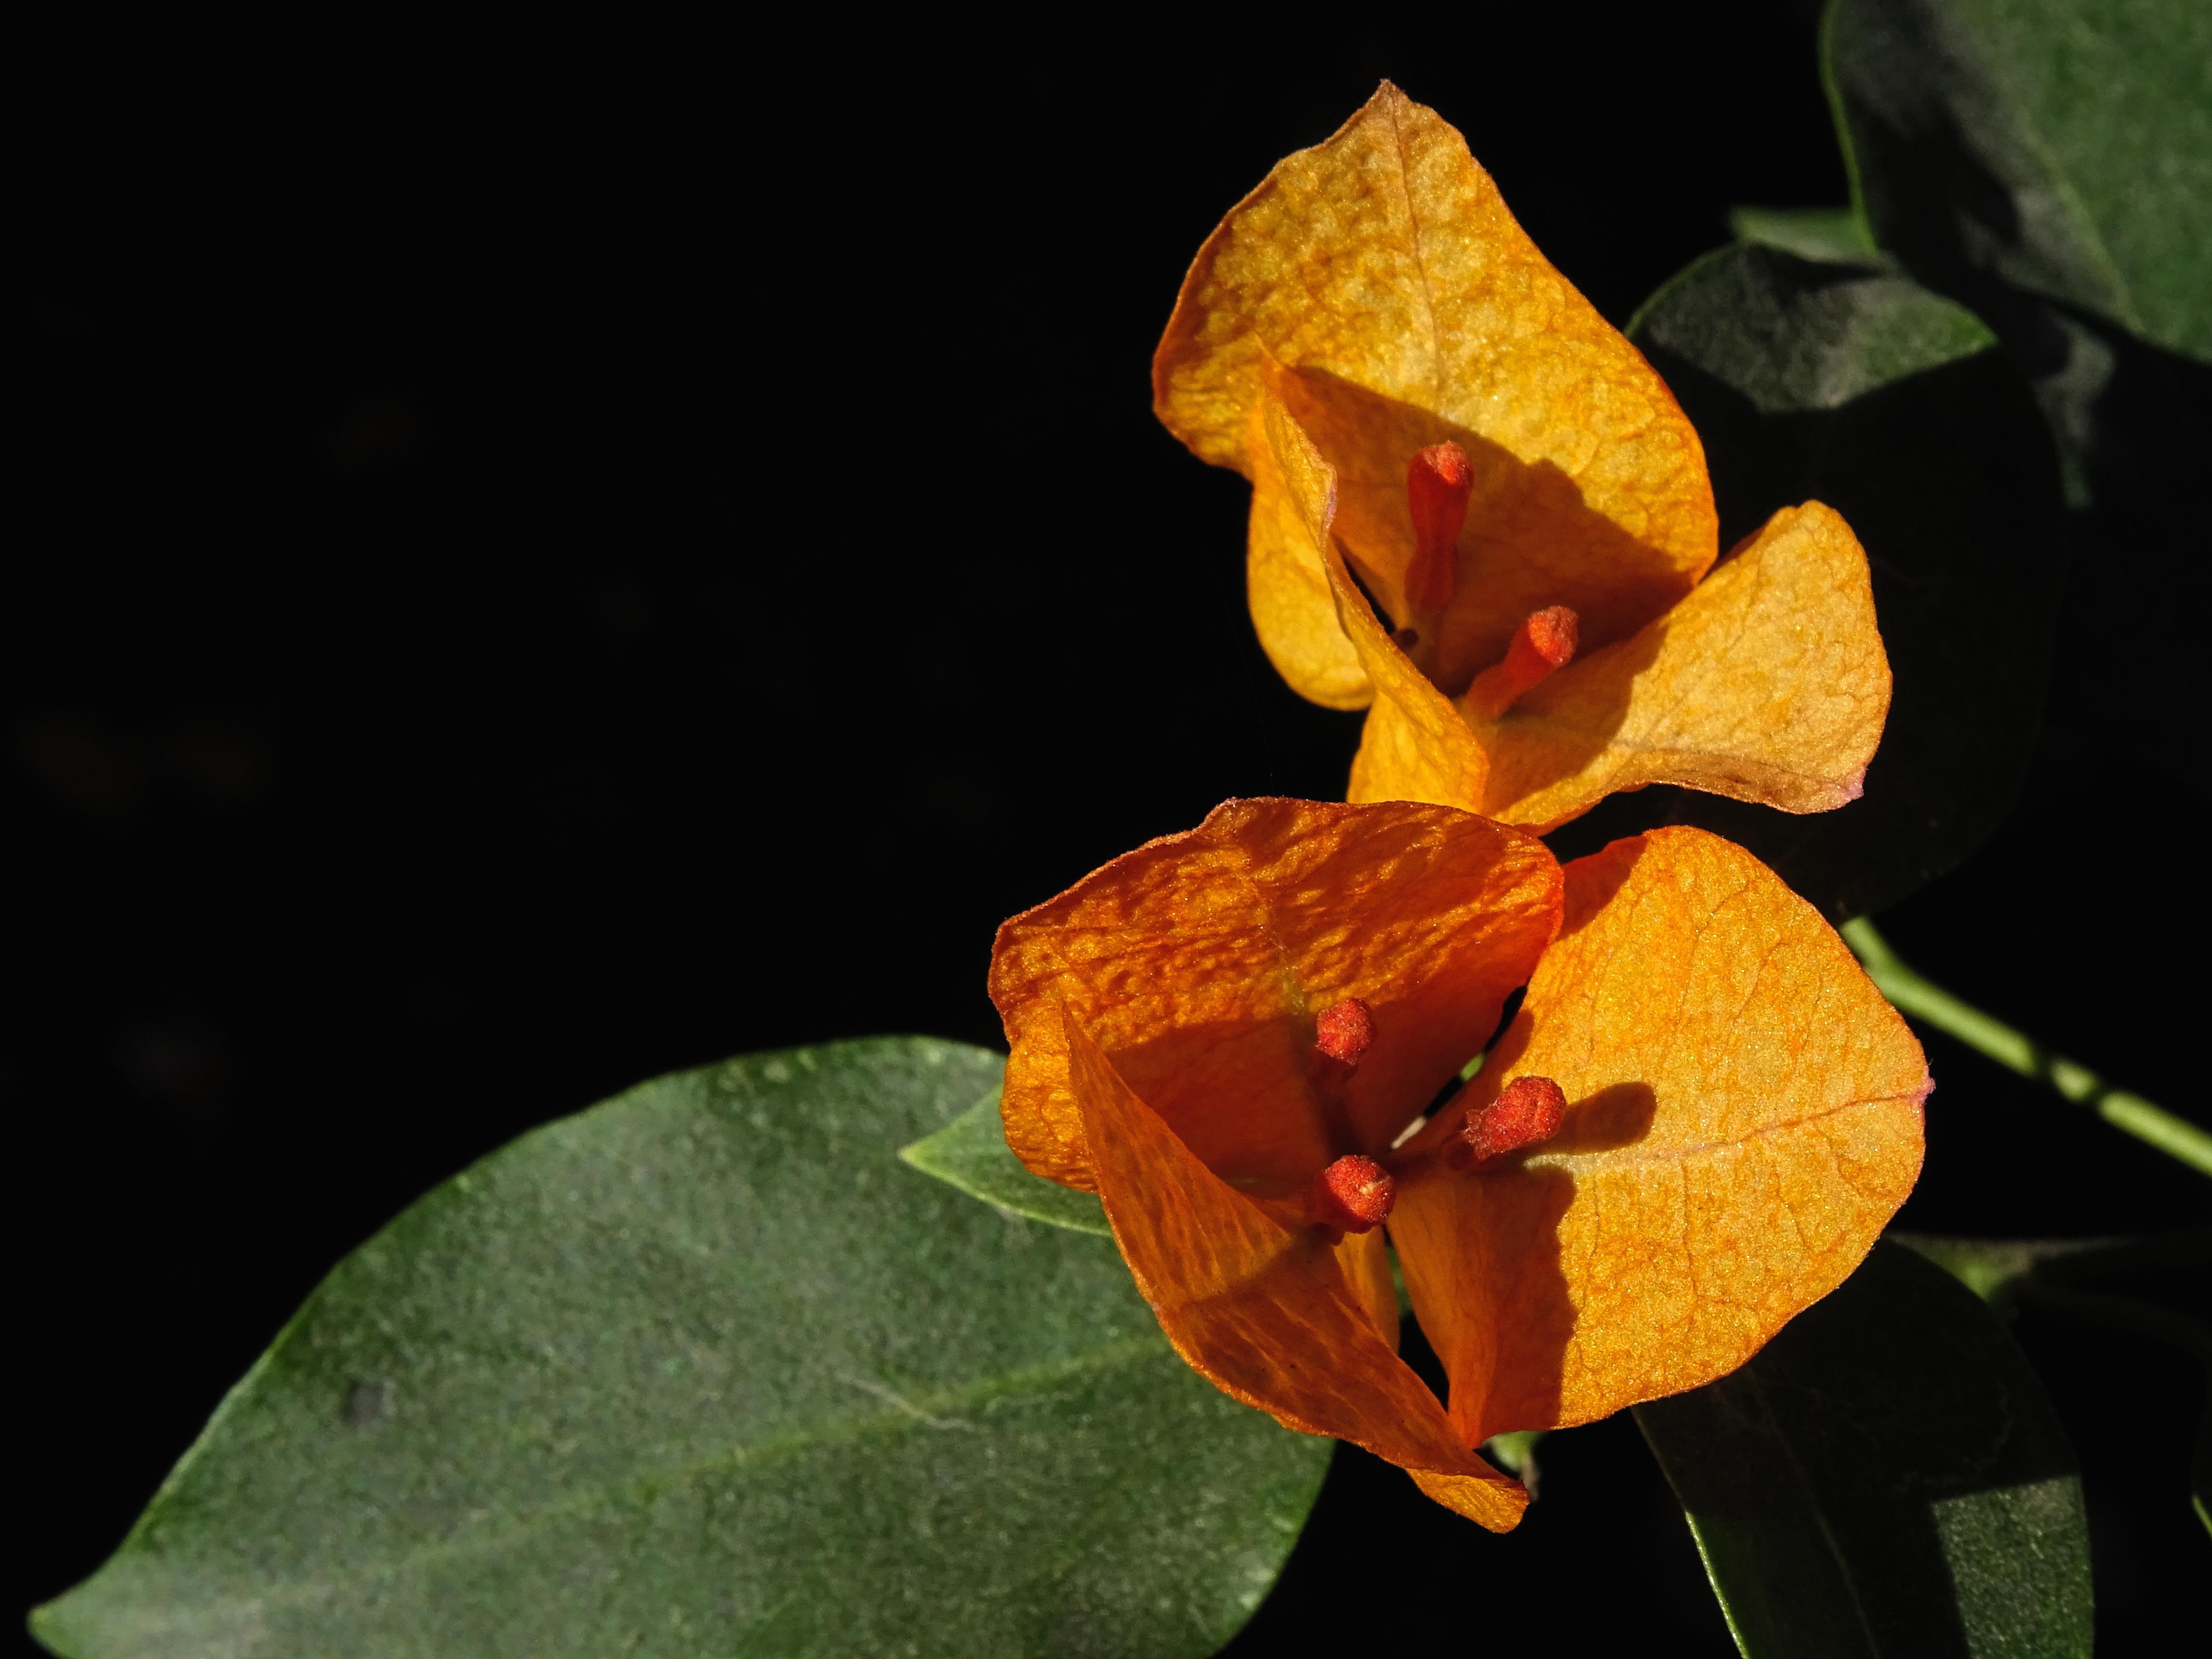 Yellow Bougainvillea Flower, Background, Garden, White, Vibrant, HQ Photo